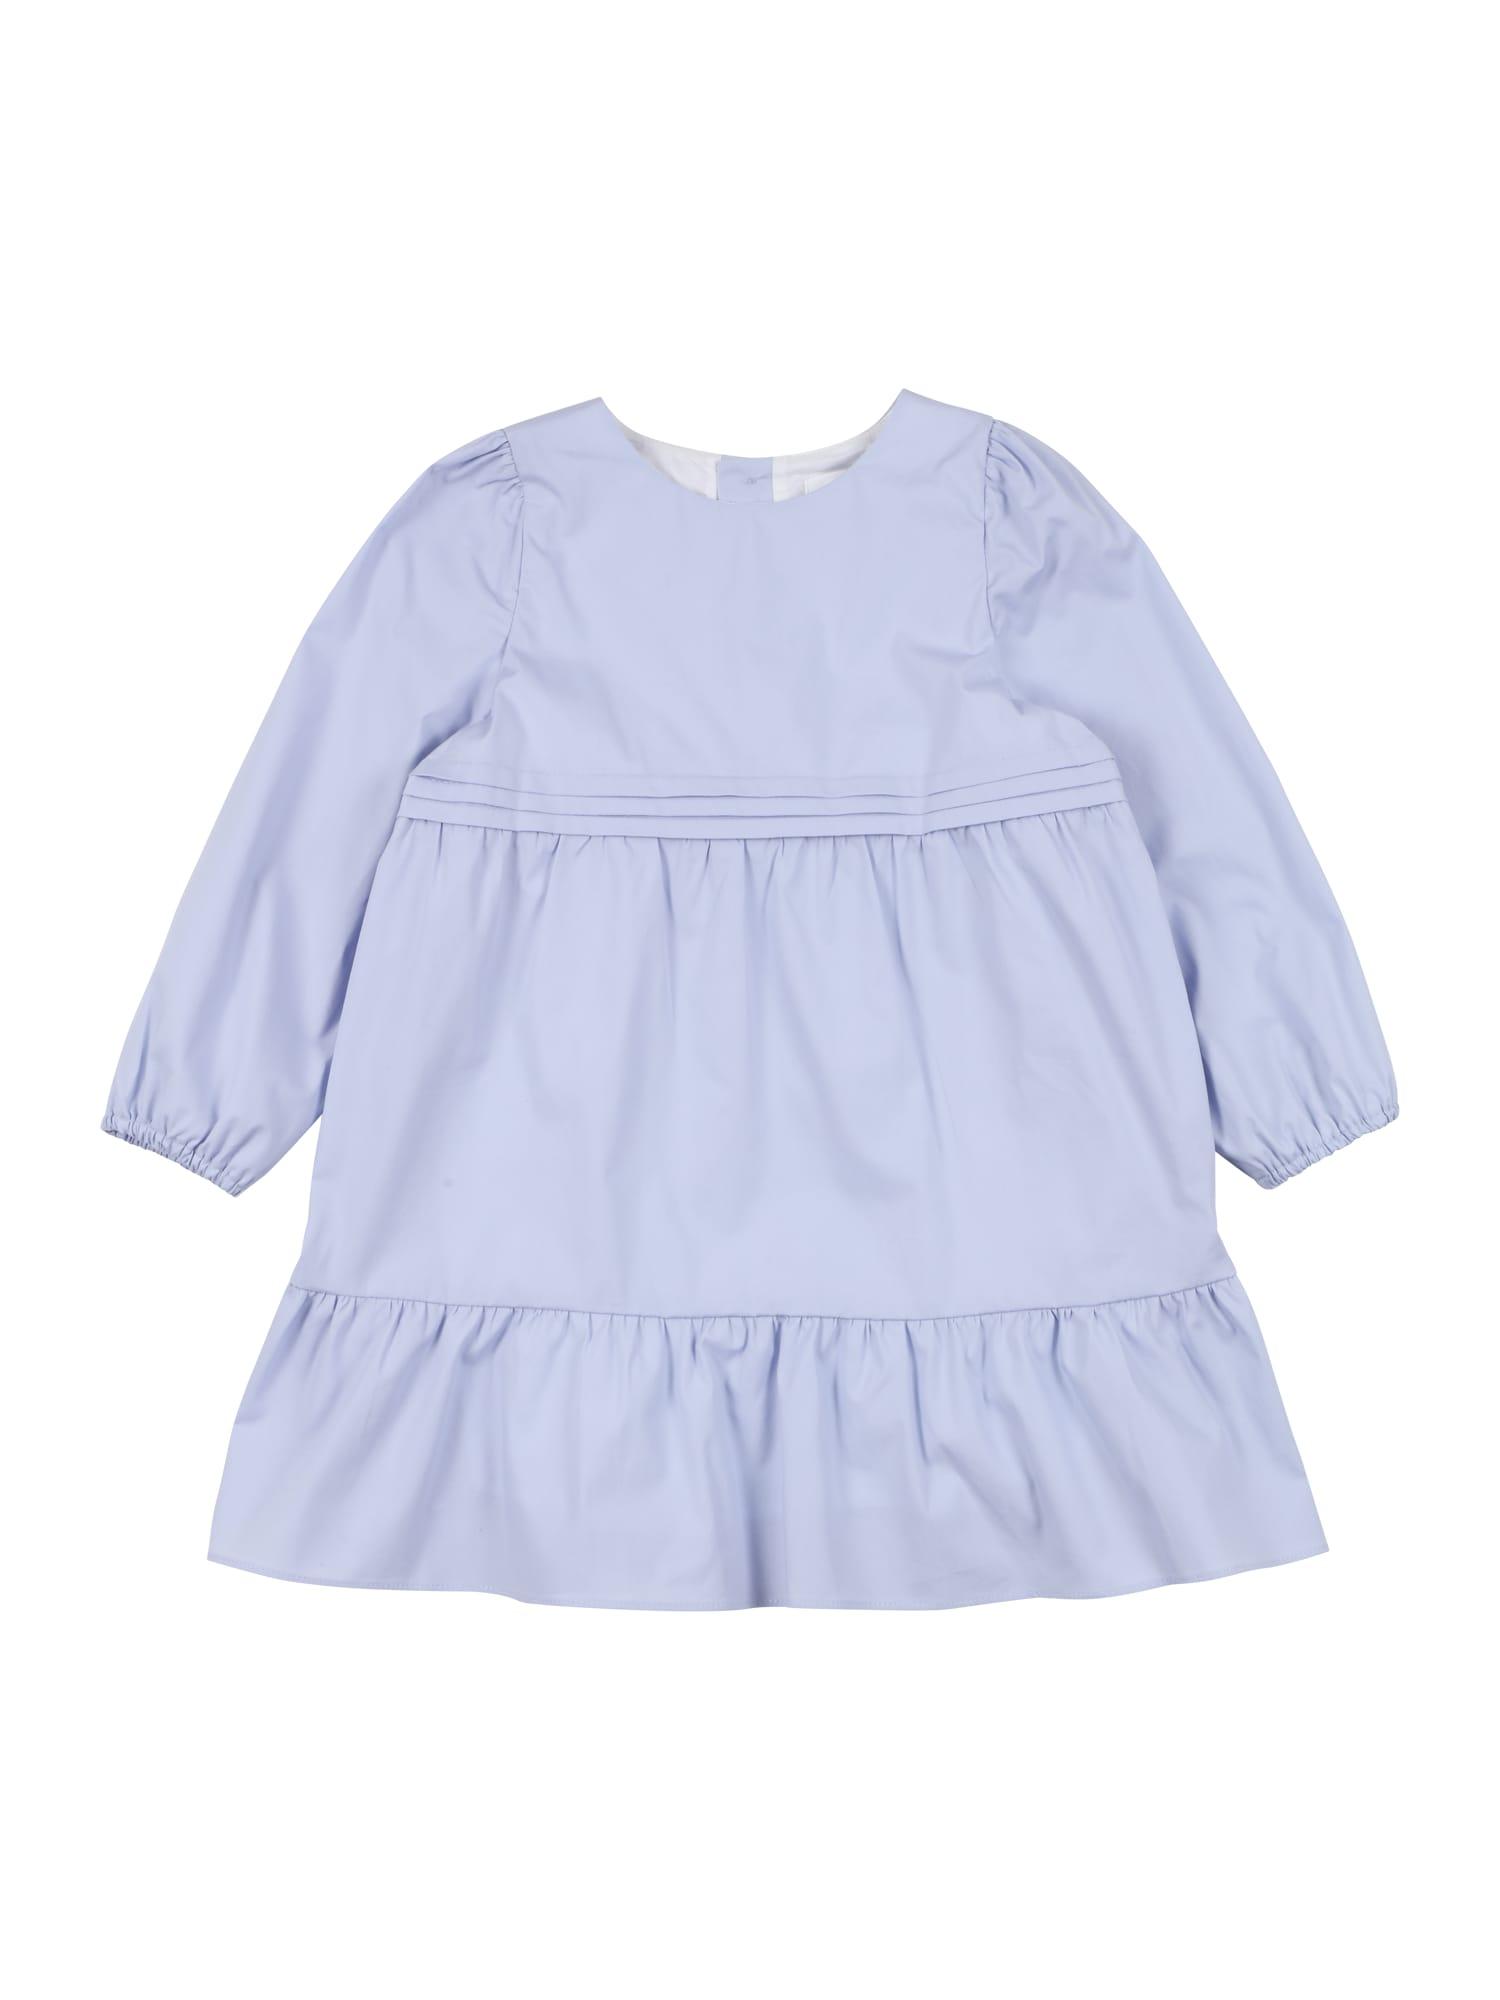 IVY & OAK KIDS Suknelė šviesiai mėlyna